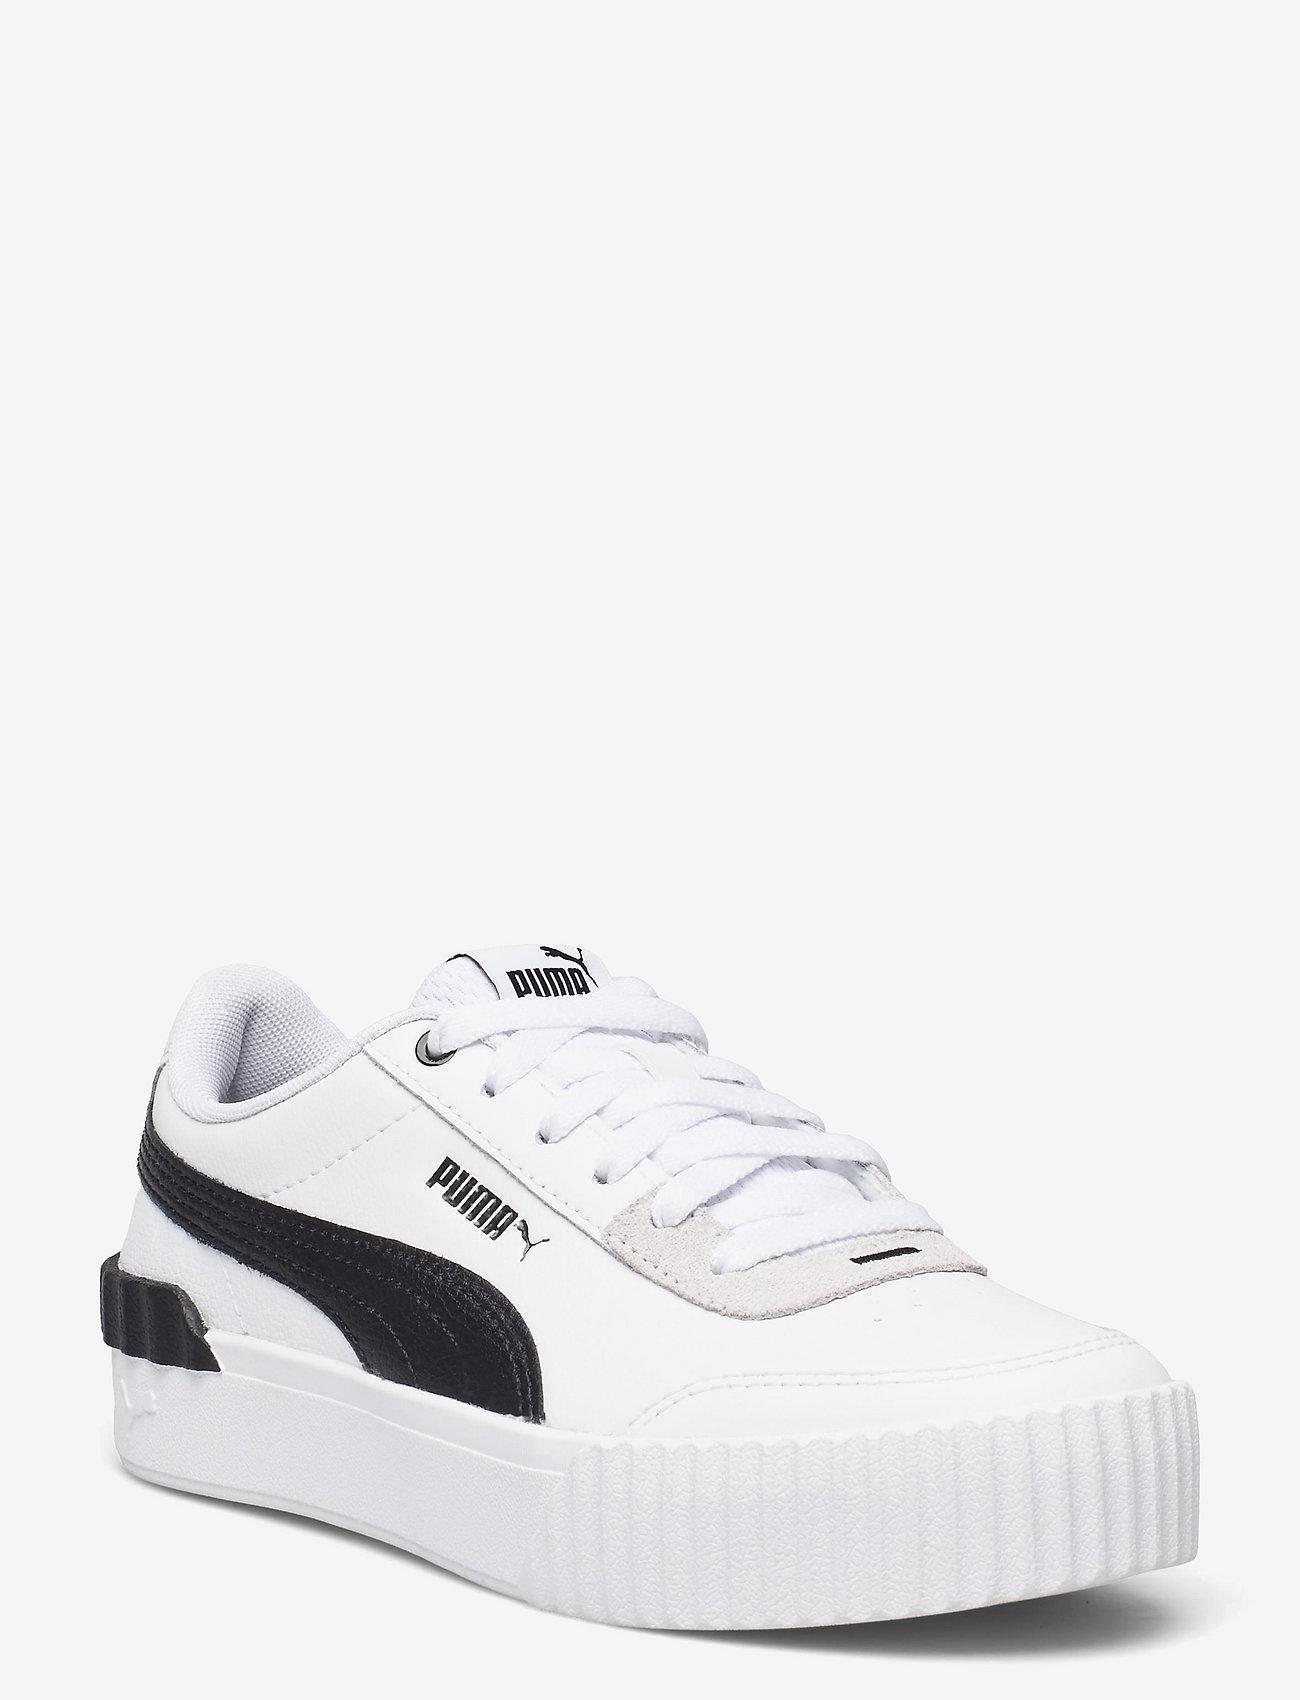 PUMA Carina Lift - Sneakers   Boozt.com